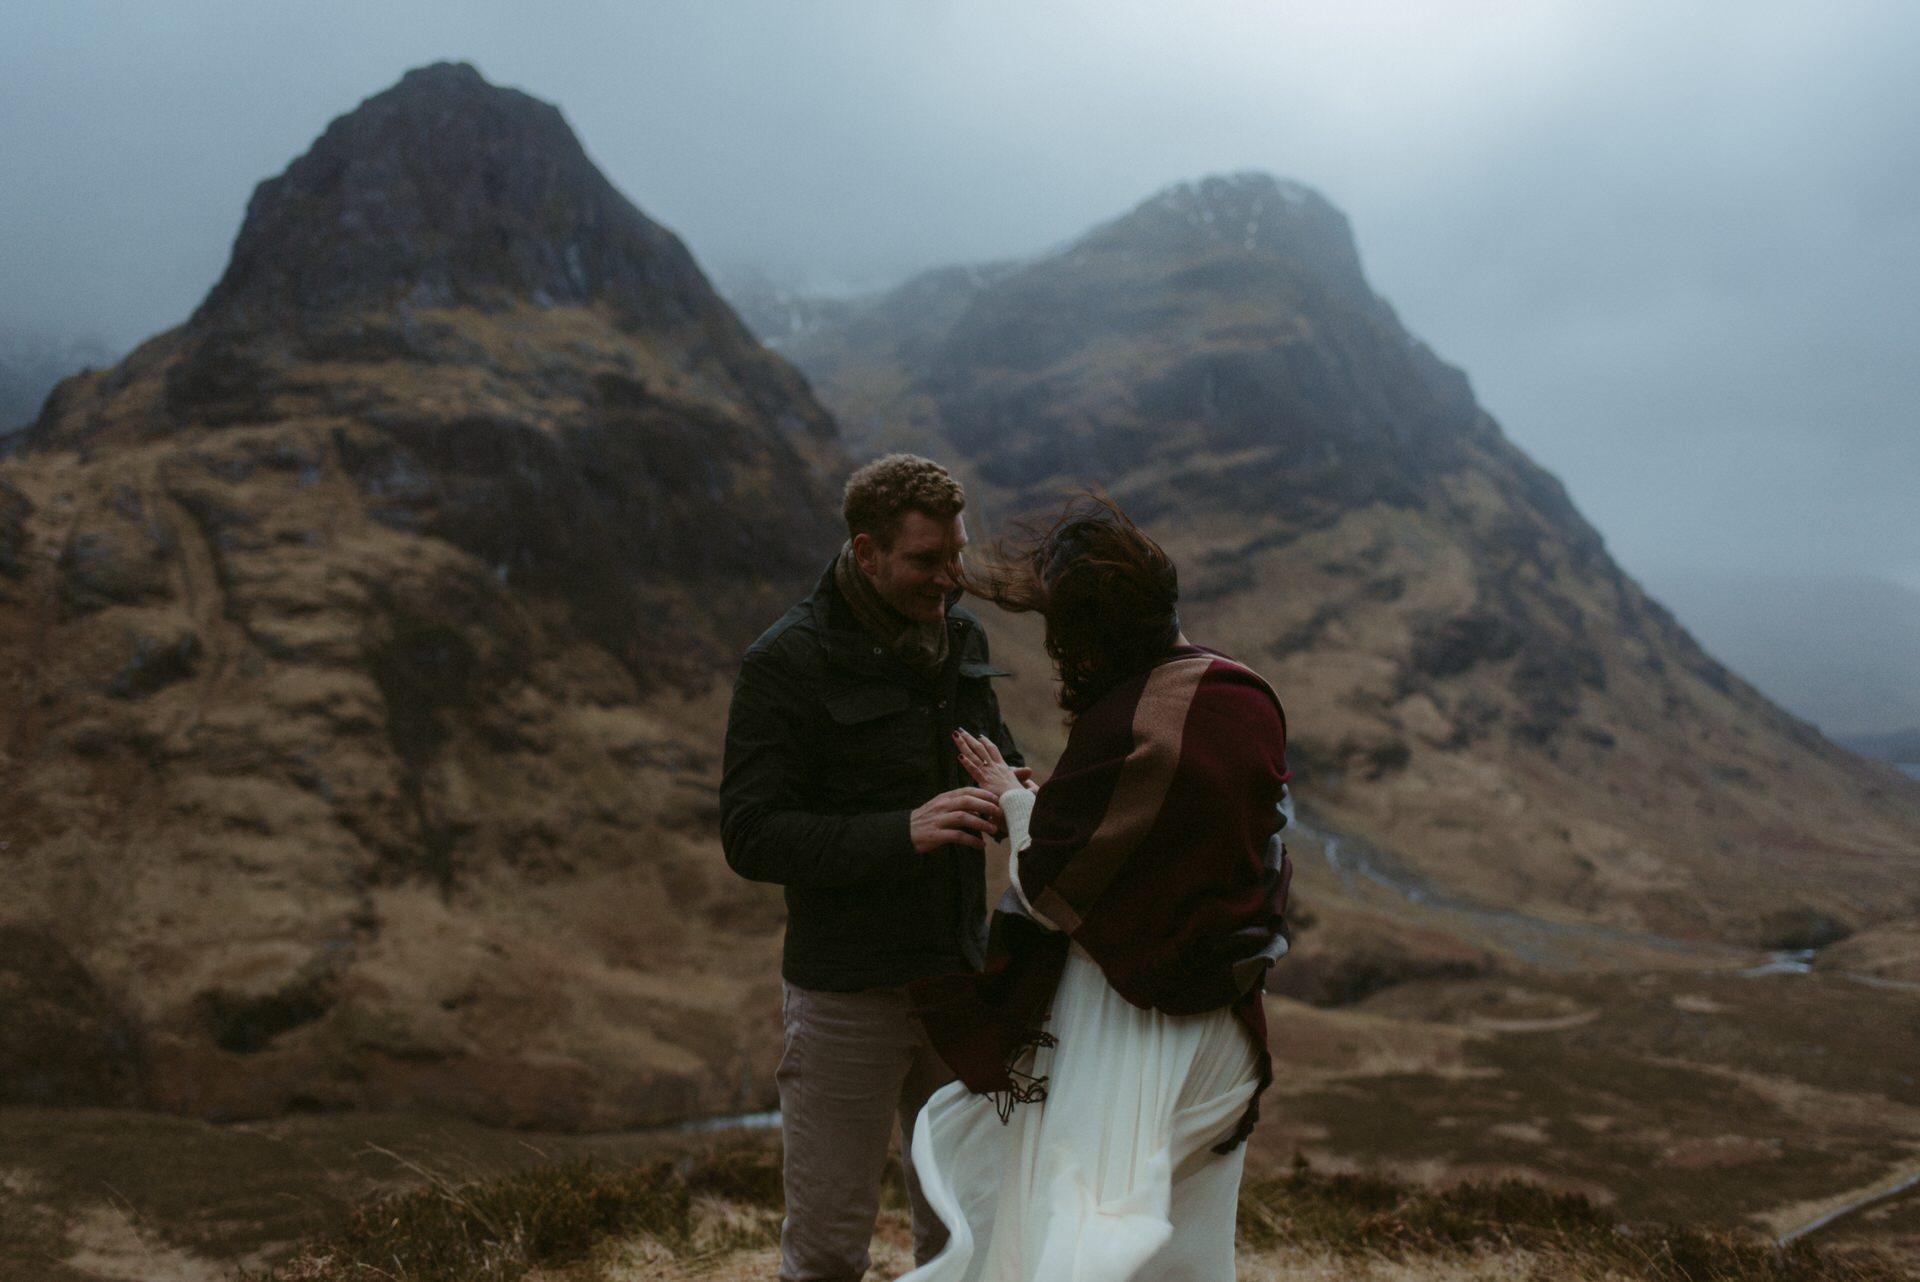 Surprise-Marriage-Proposal-Glencoe_62